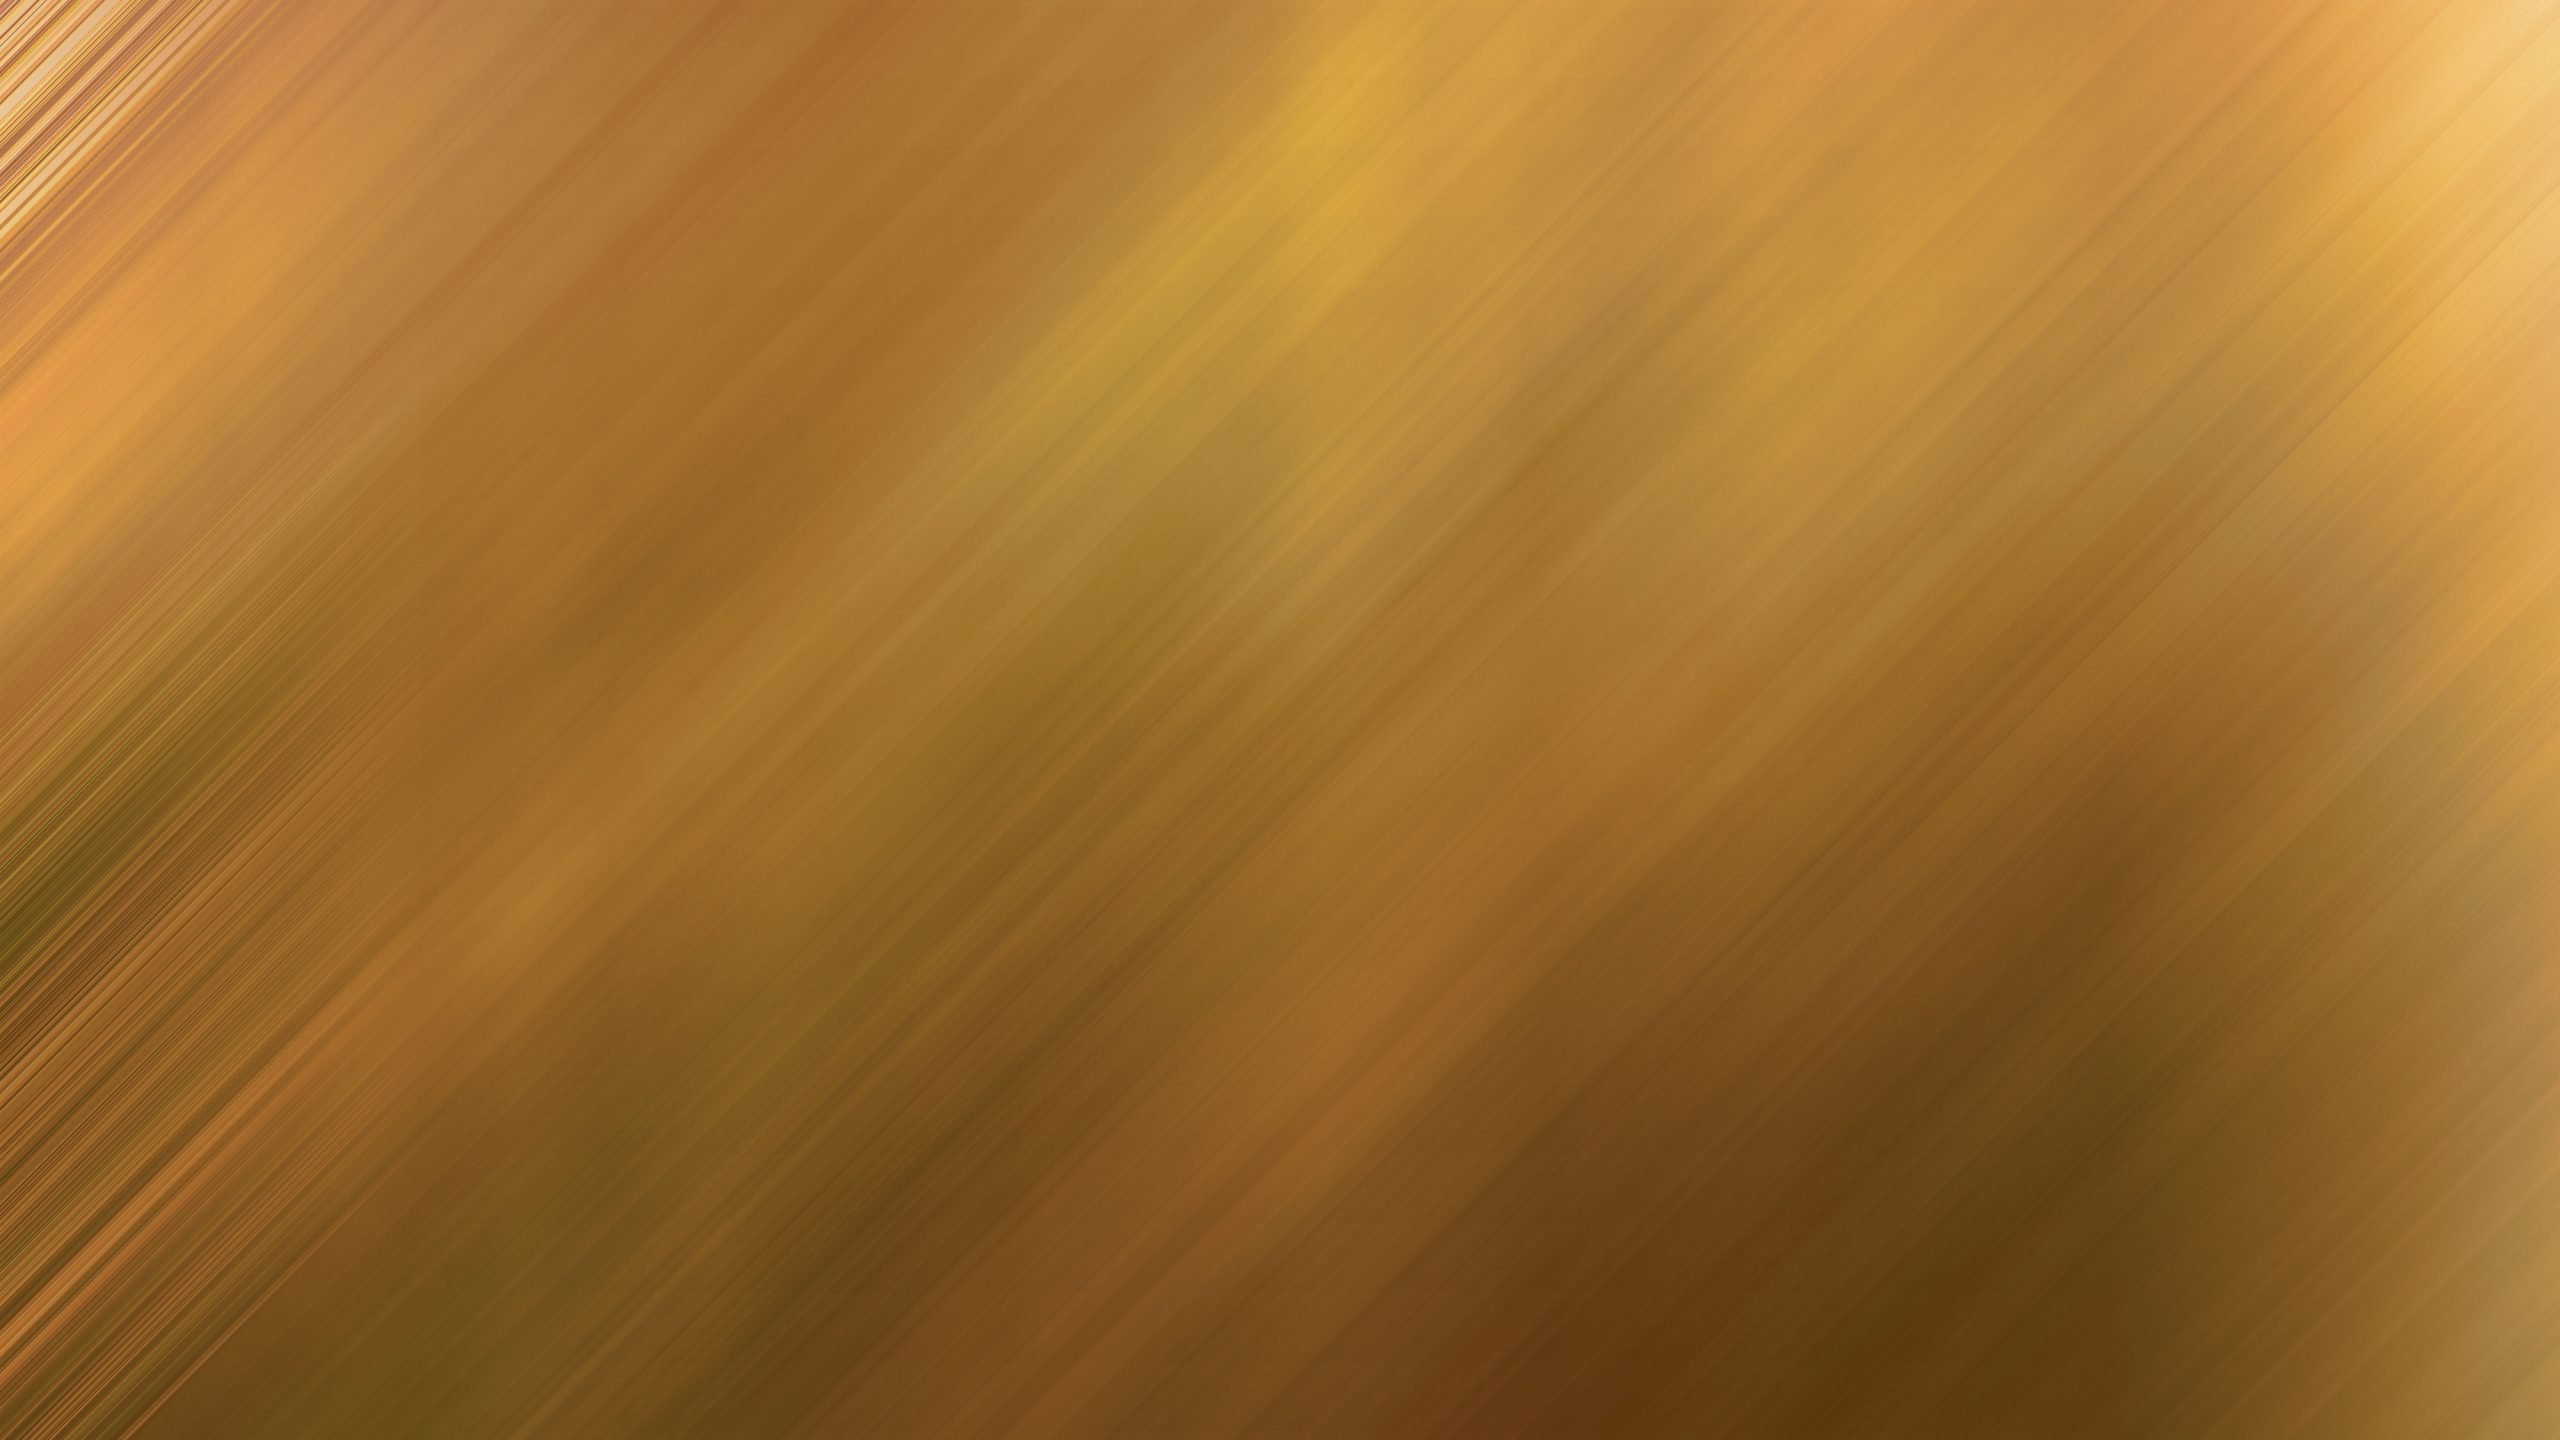 golden-pattern-abstract-background-wallpaper